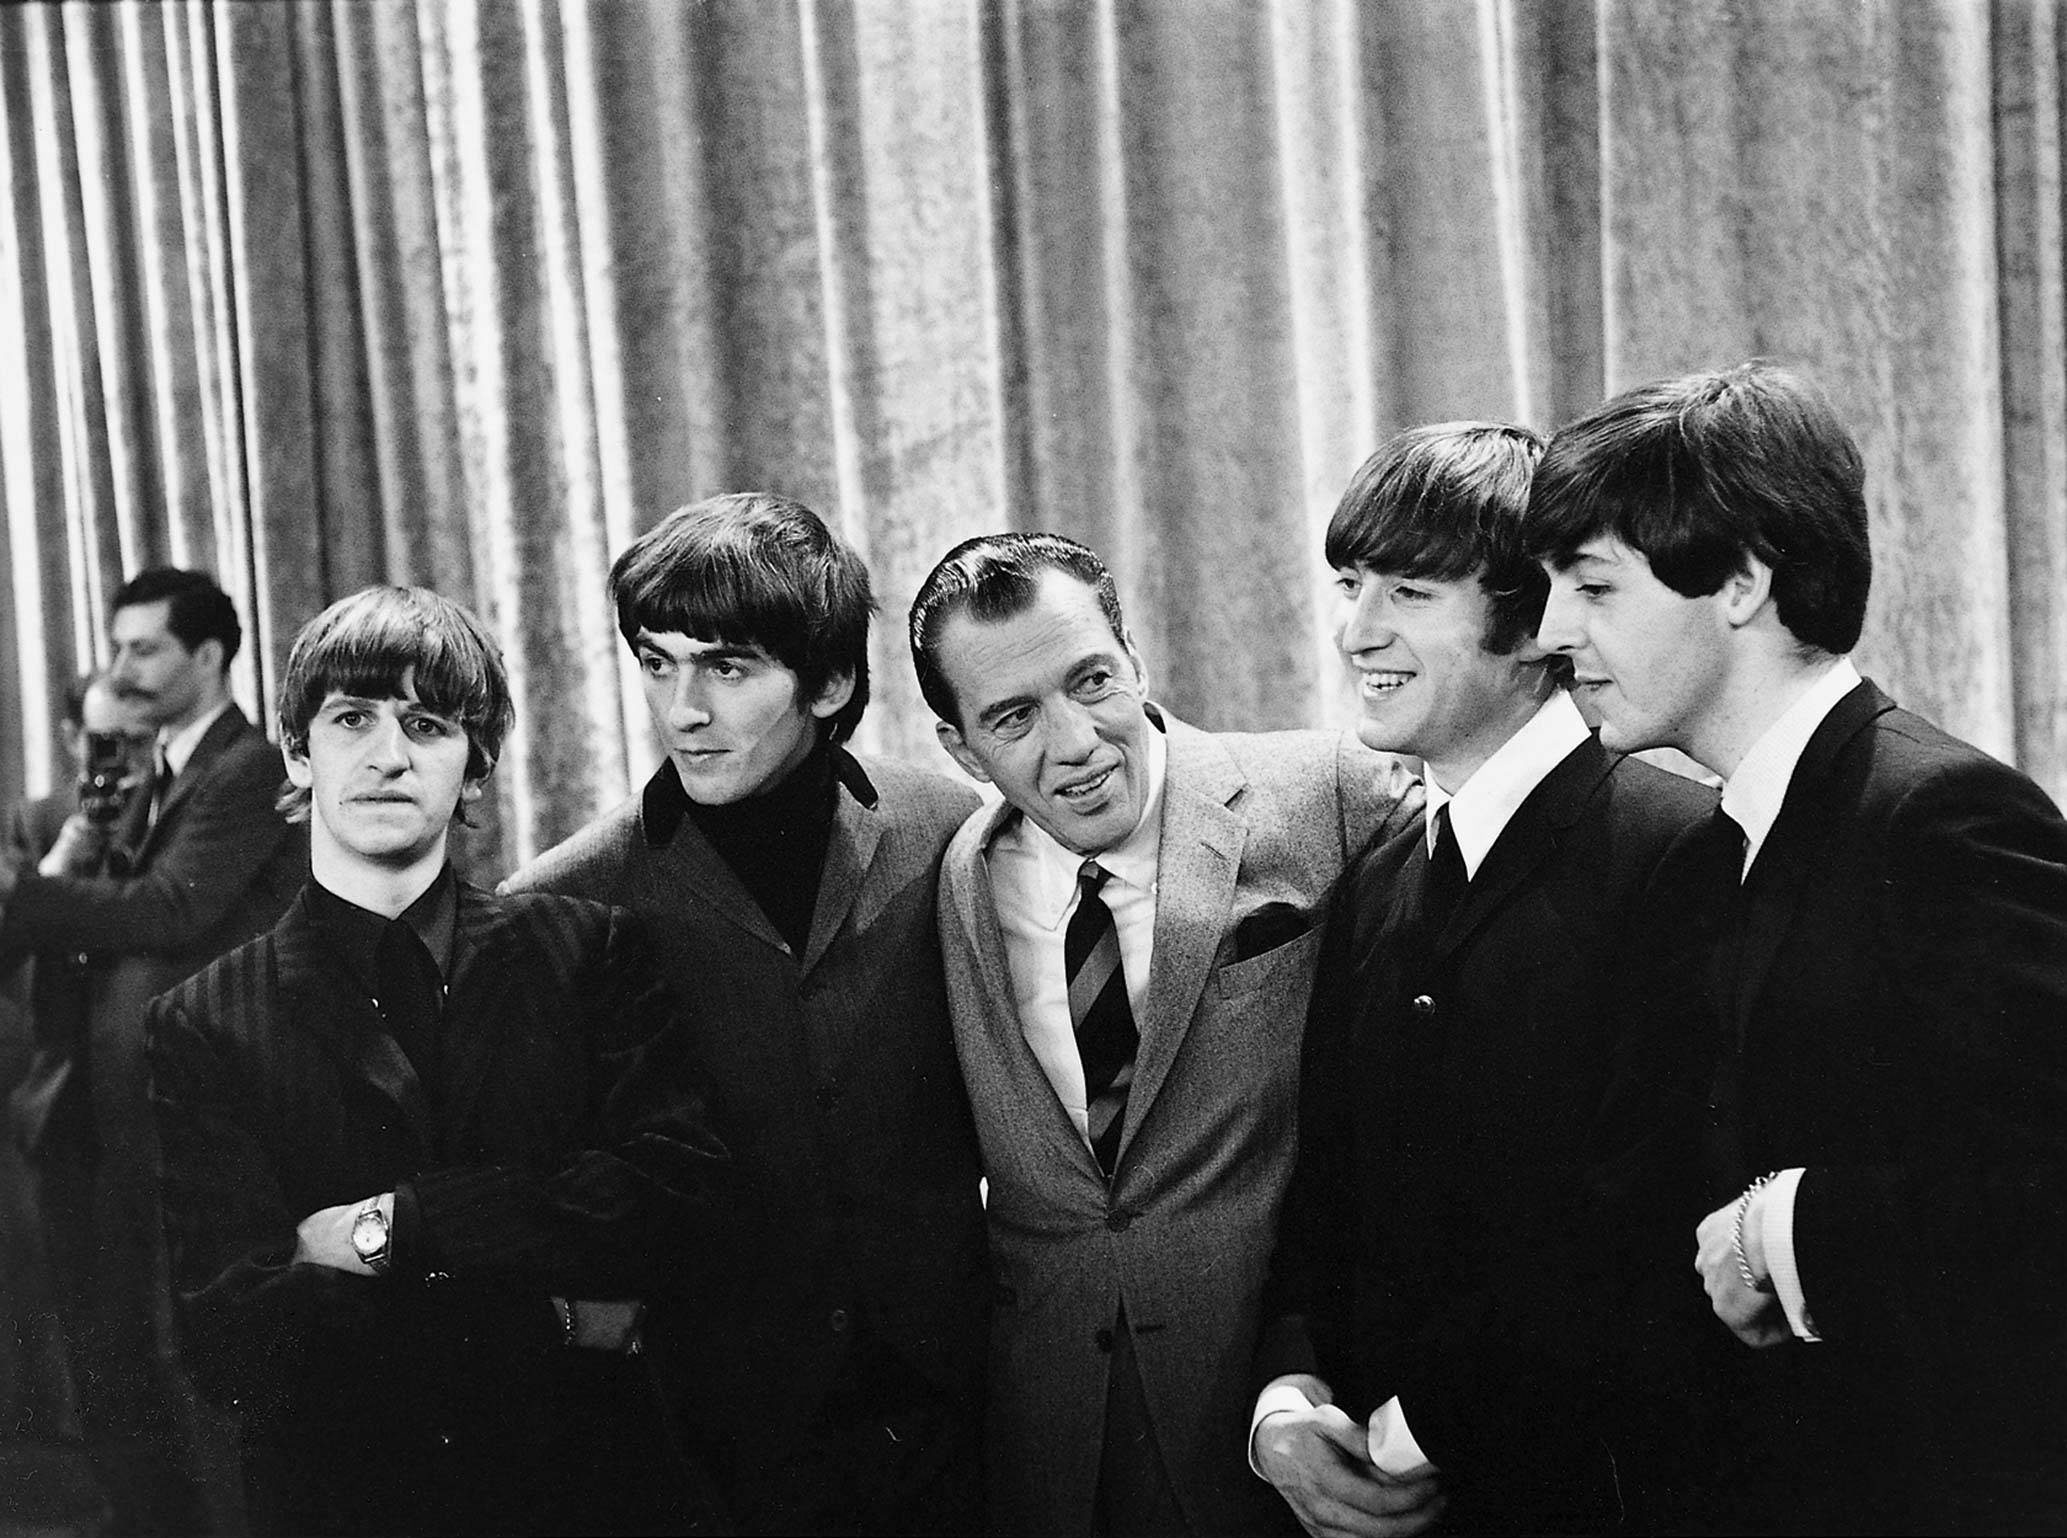 Ed Sullivan with The Beatles